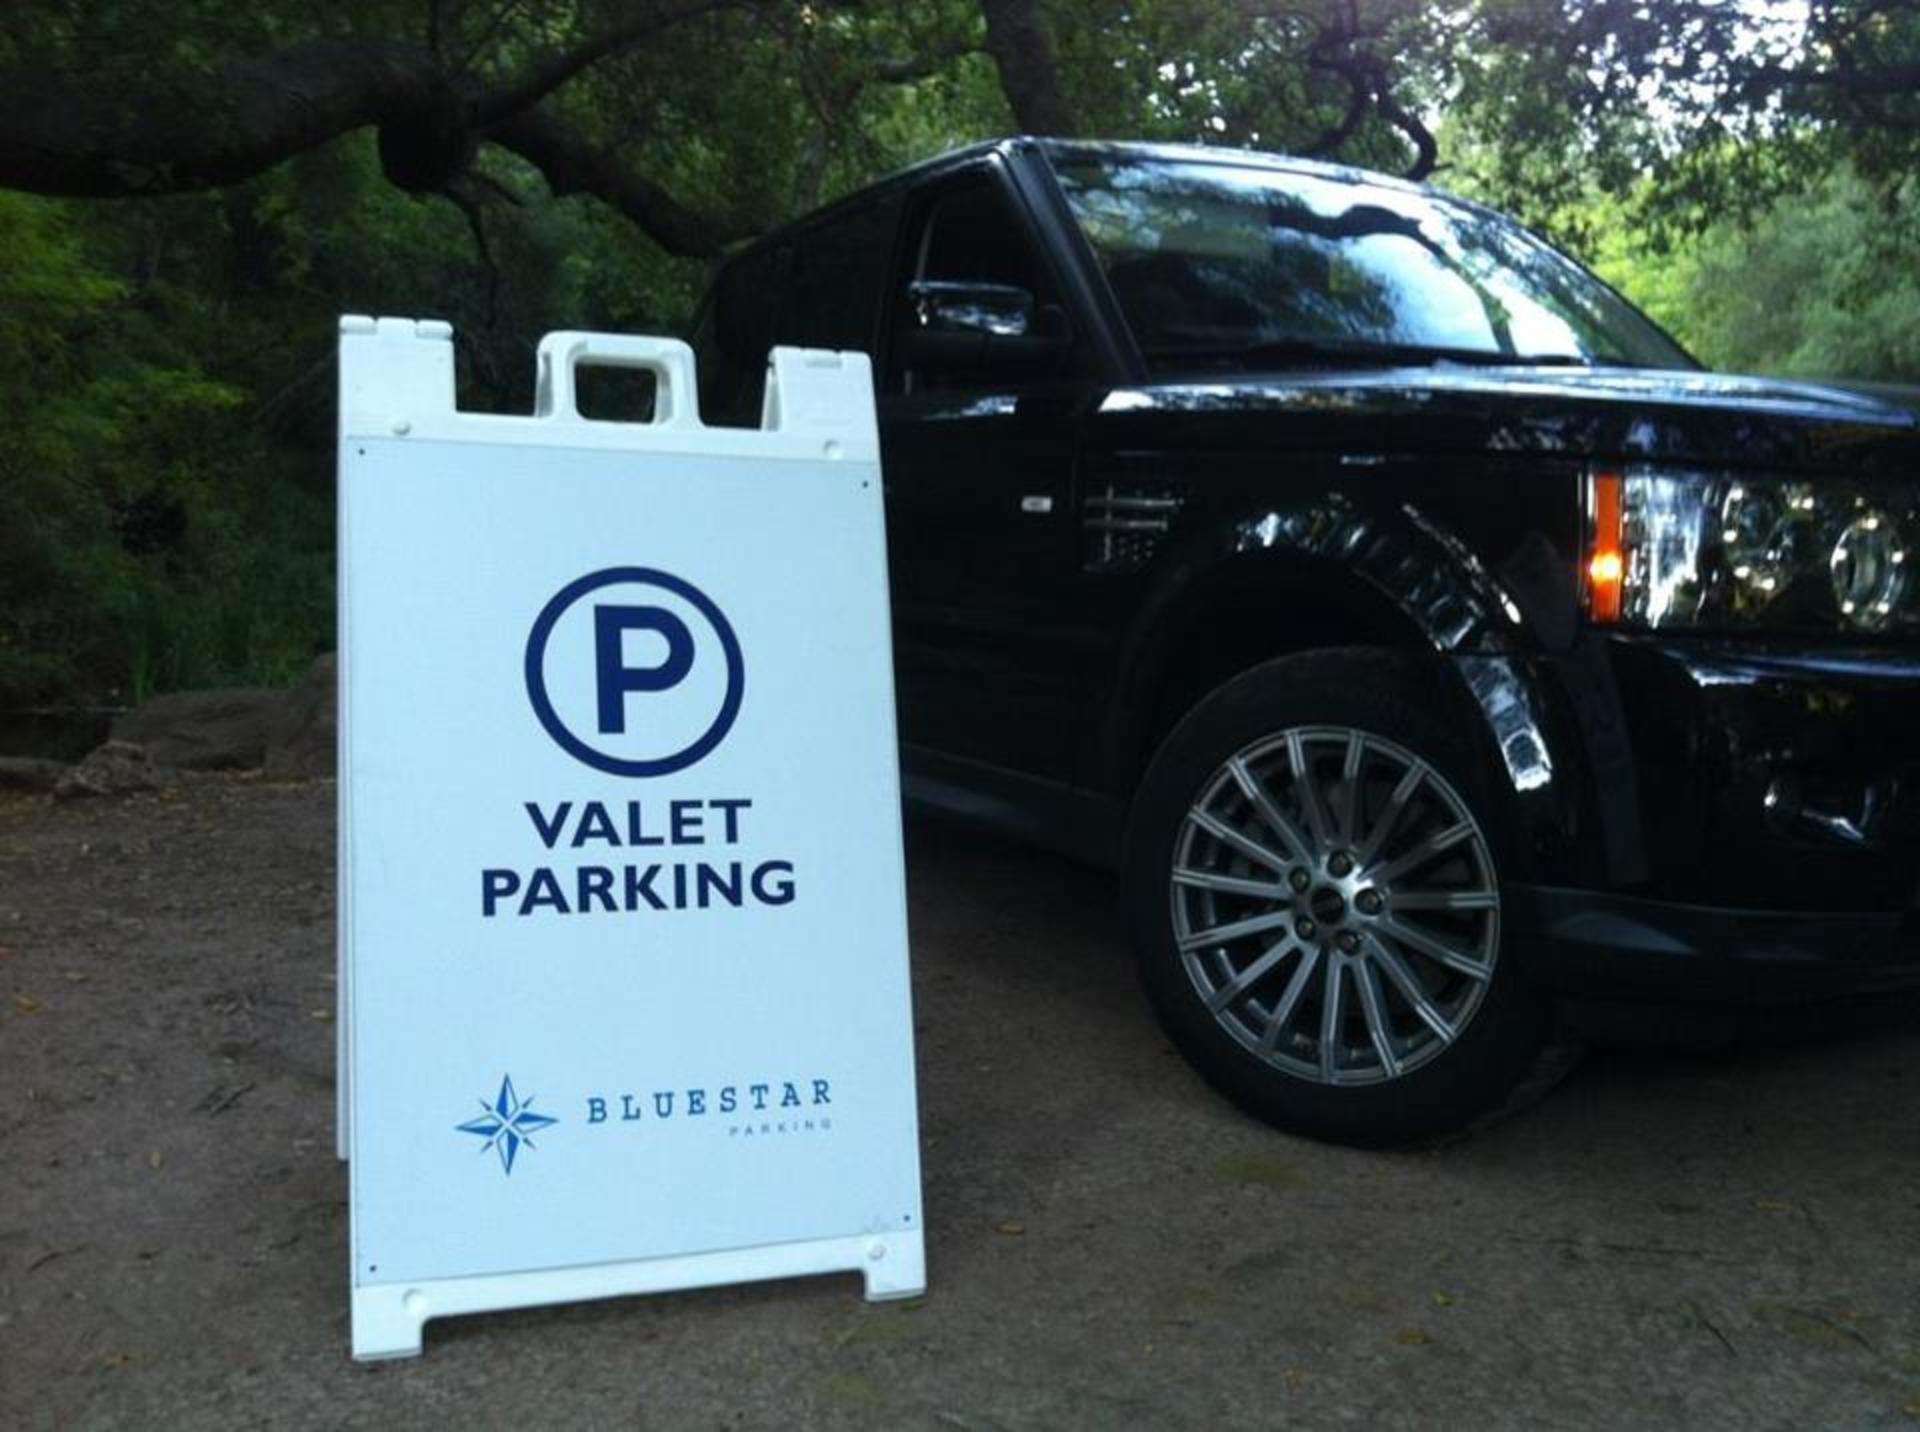 BlueStar Parking image 1